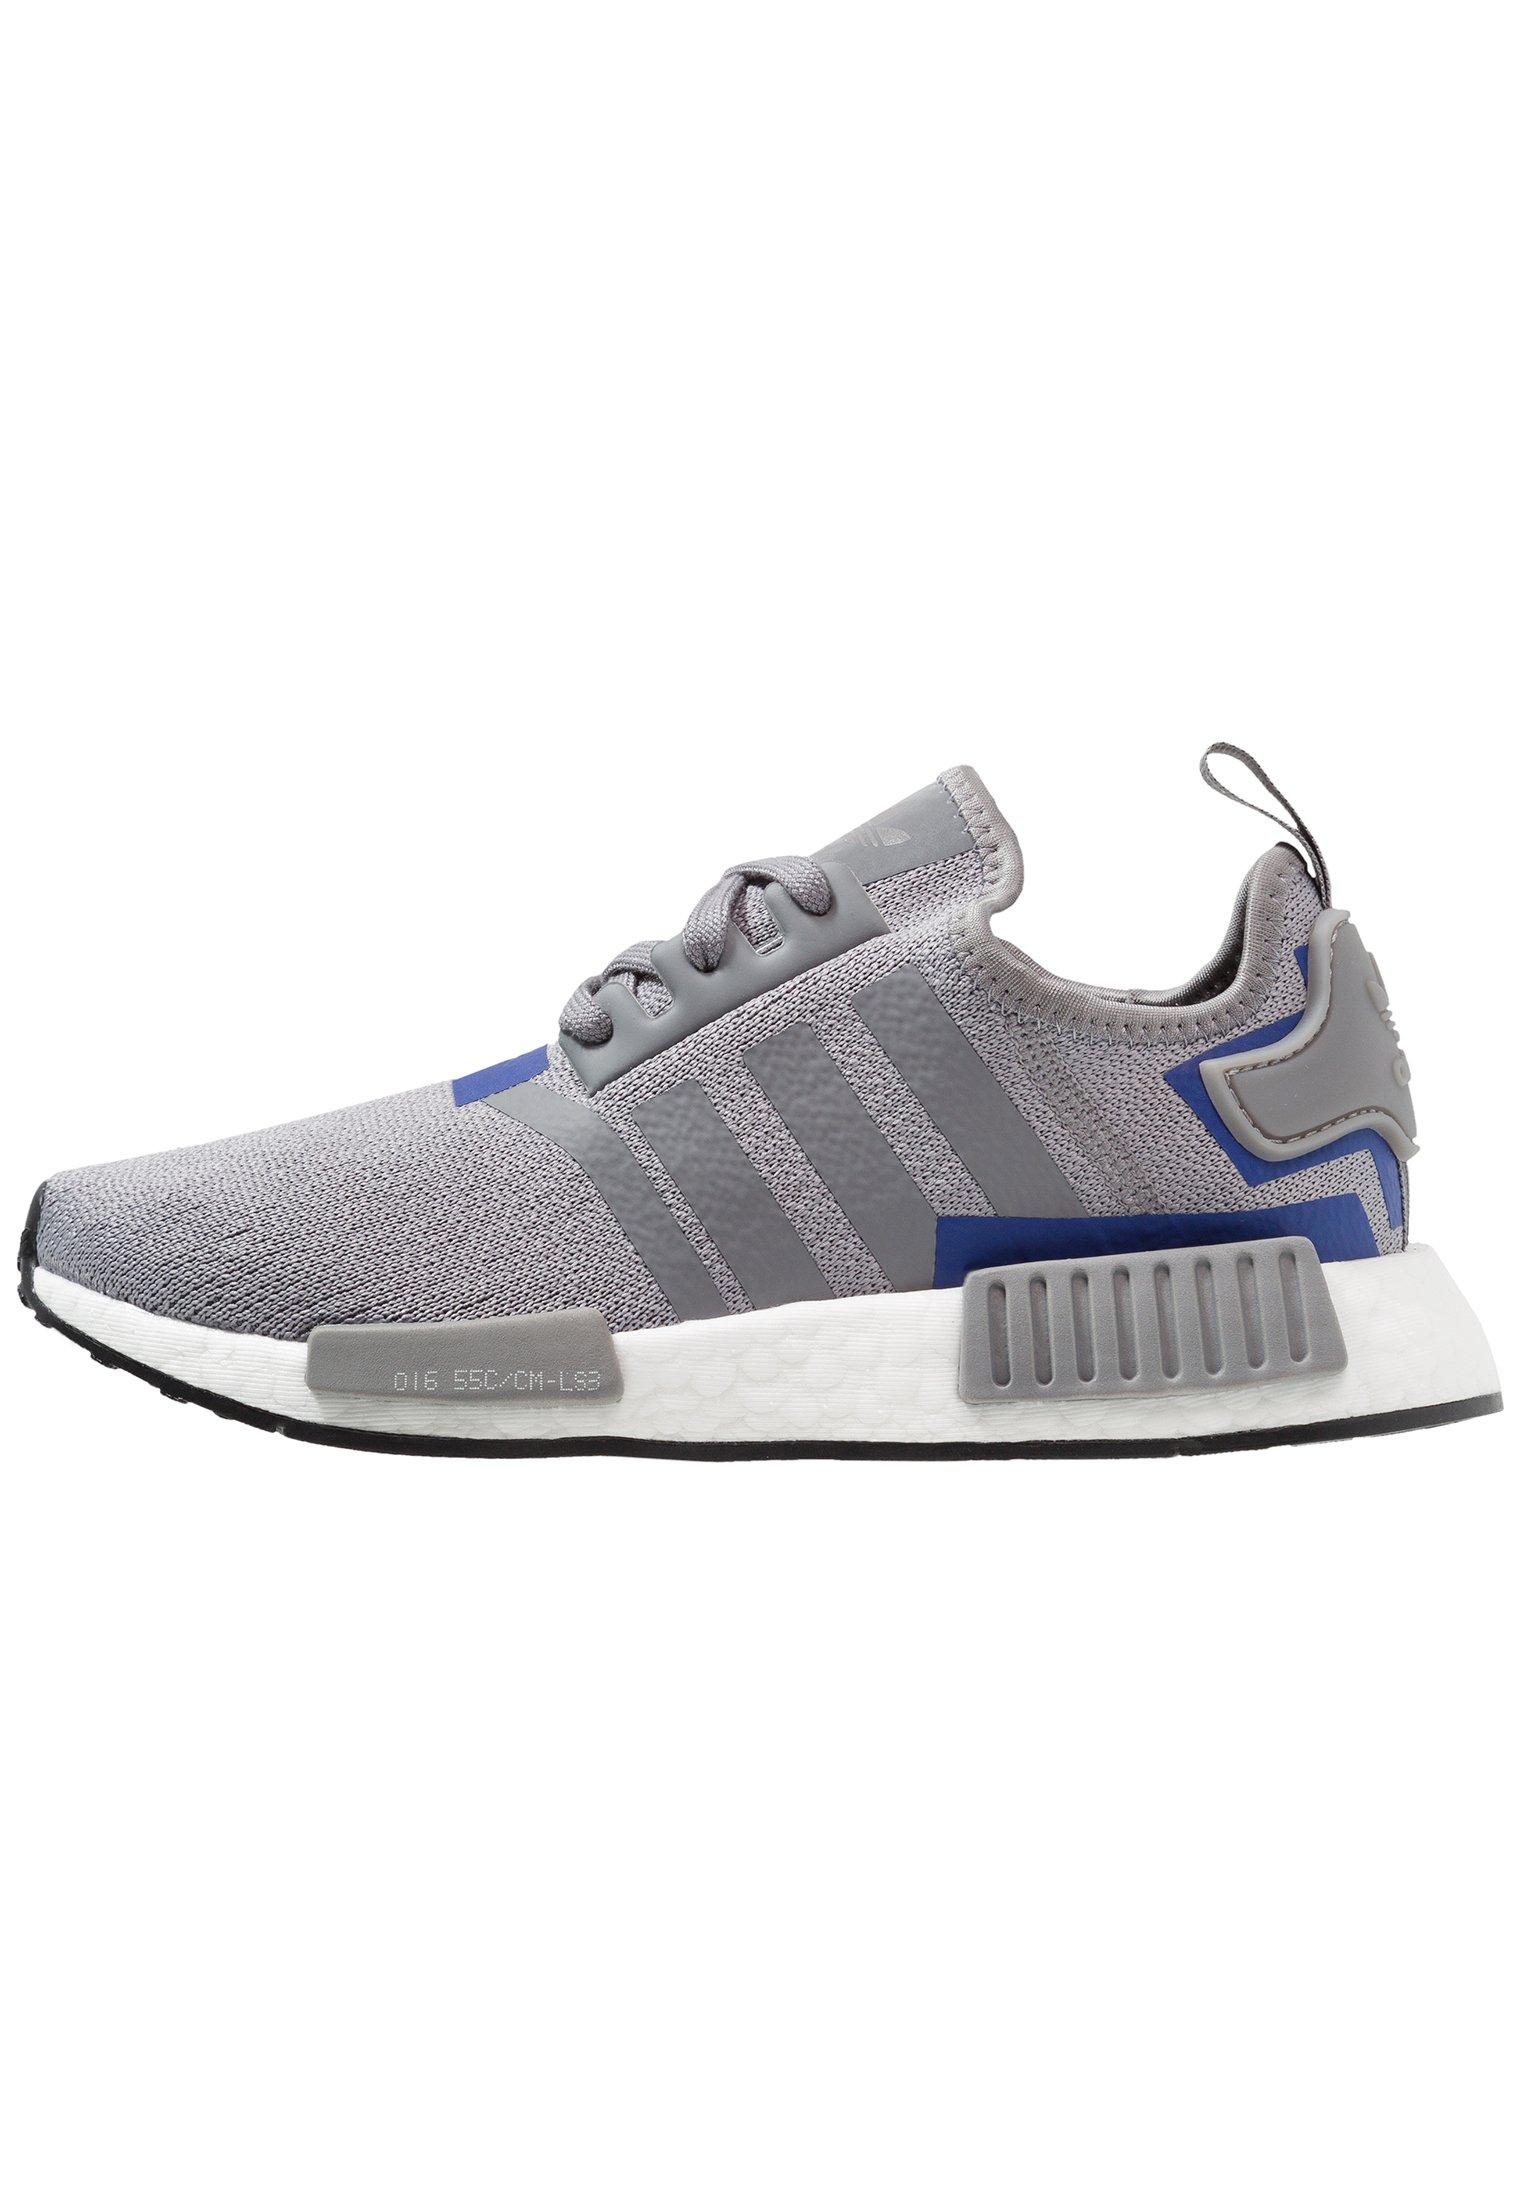 nmd_r1 sneaker low grey